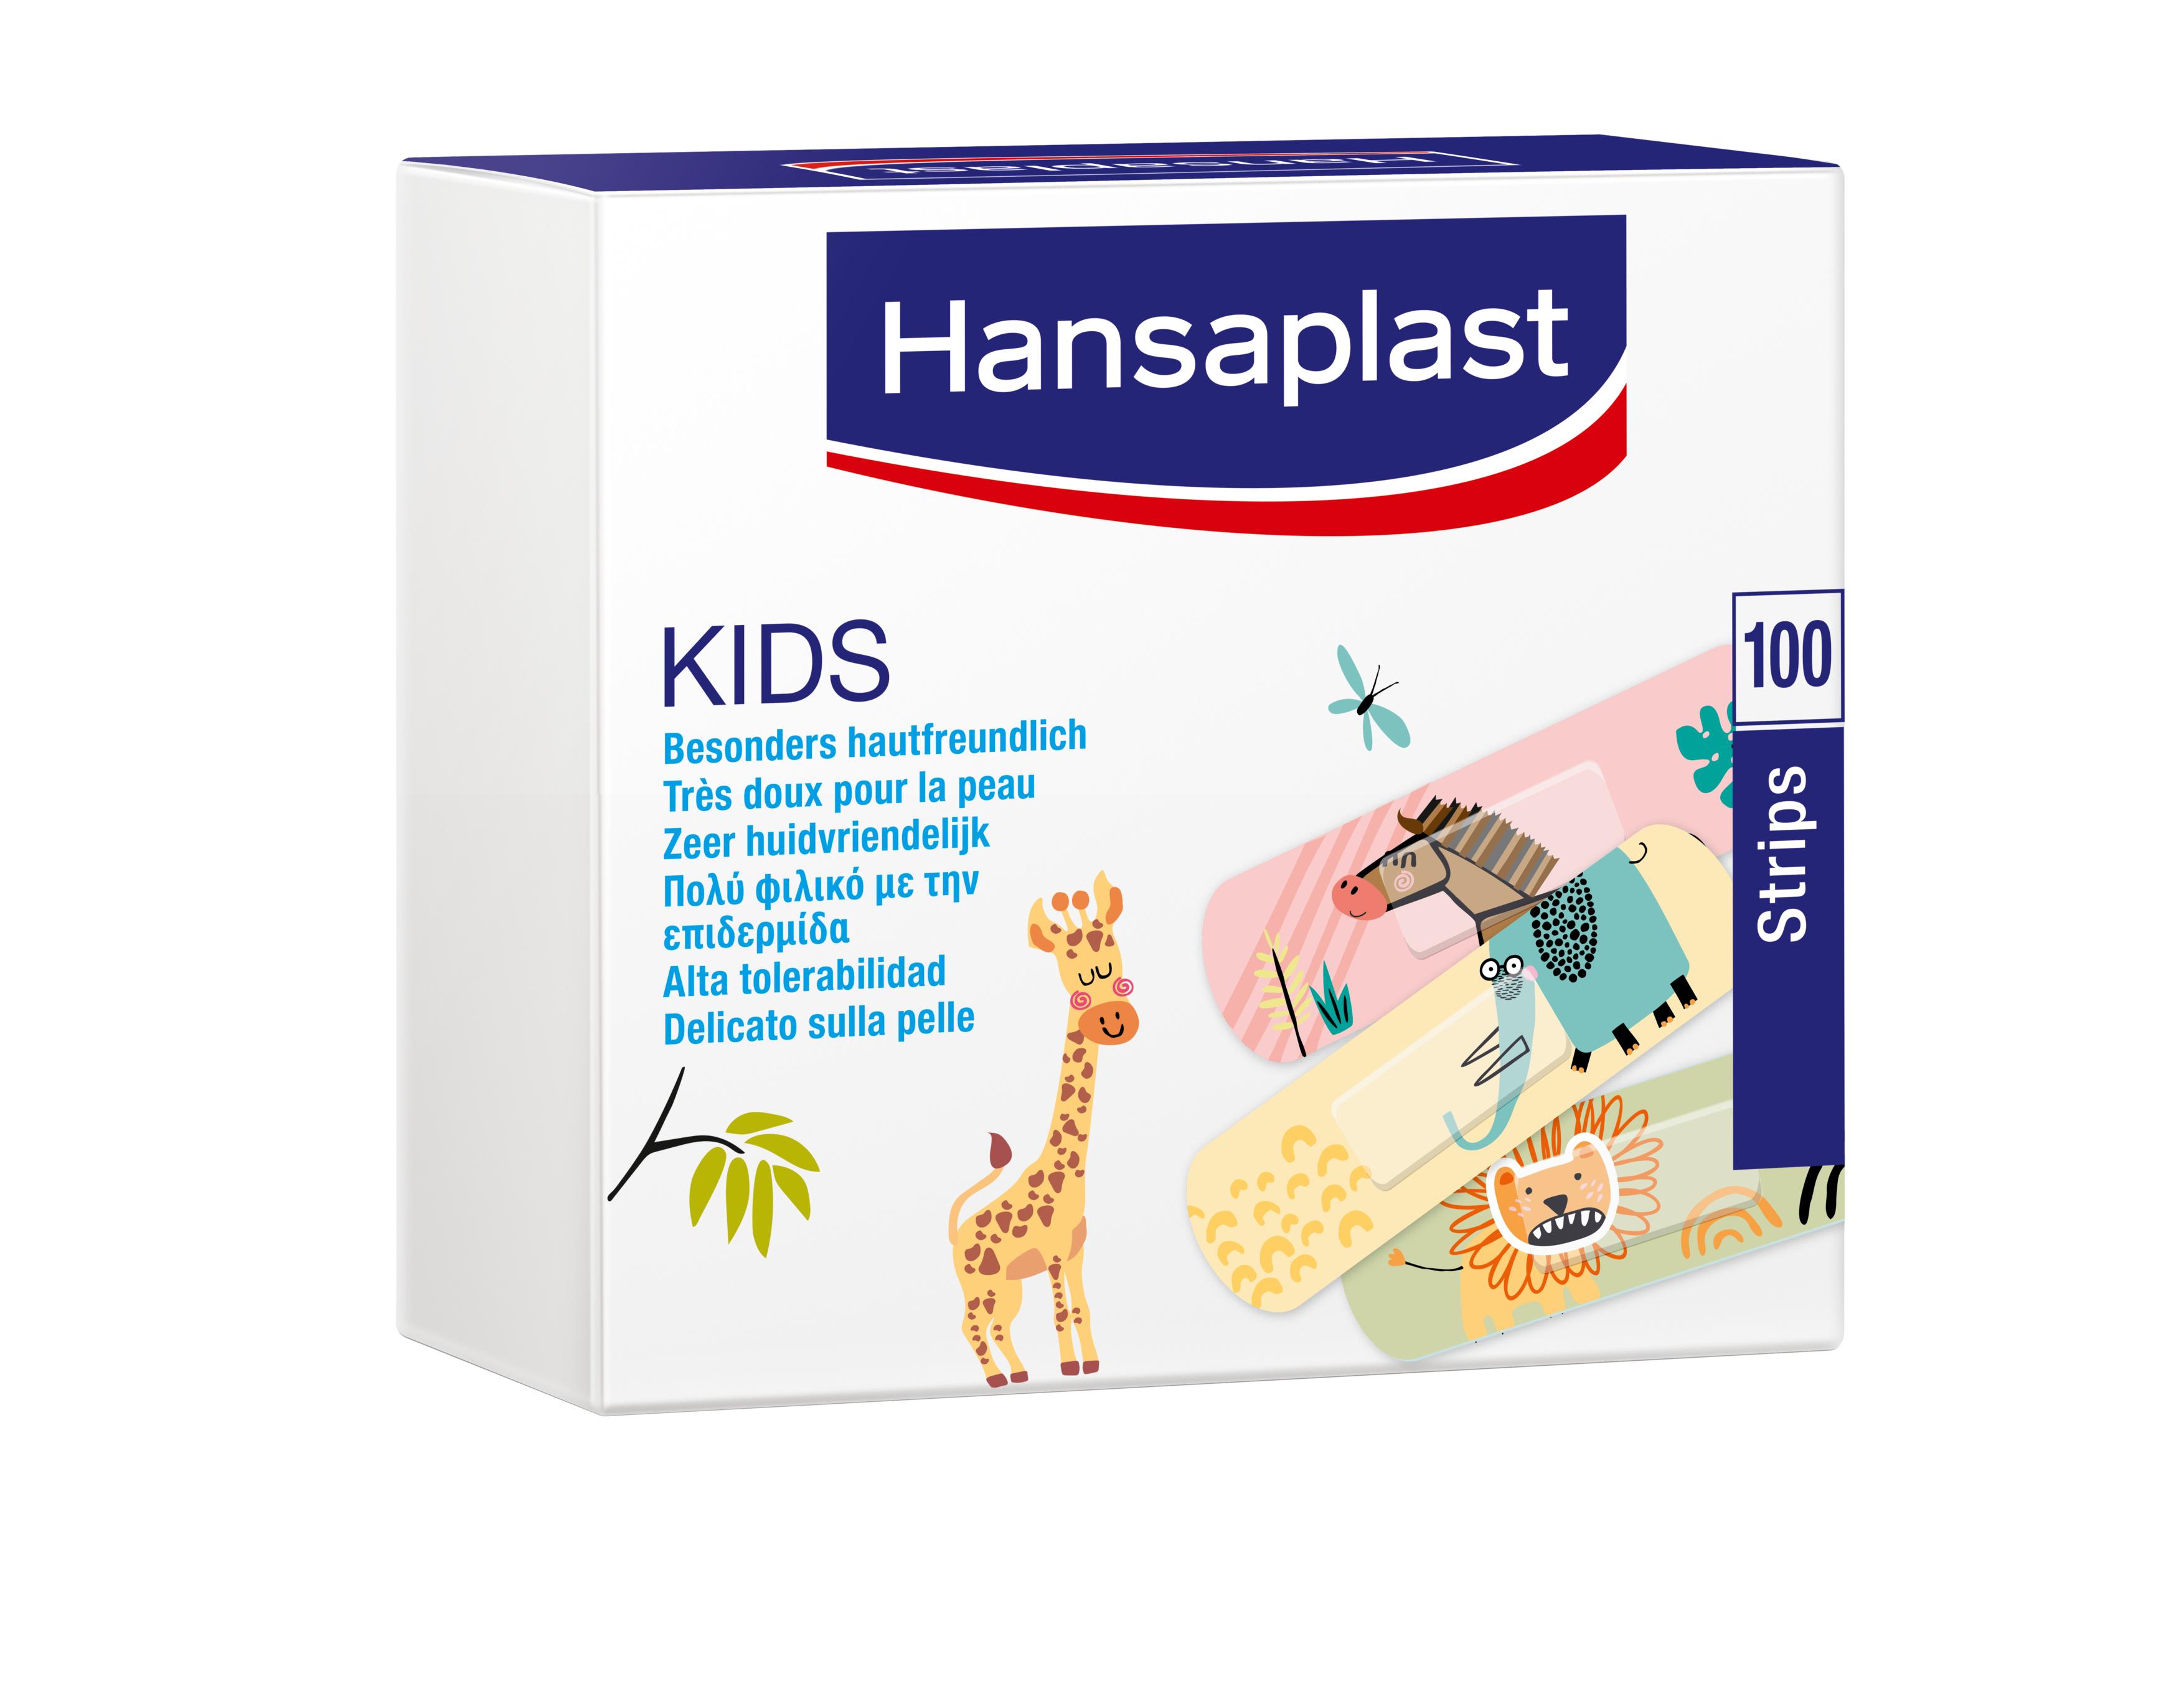 Hansaplast Kids 100er Packung, 1,9x7,2cm